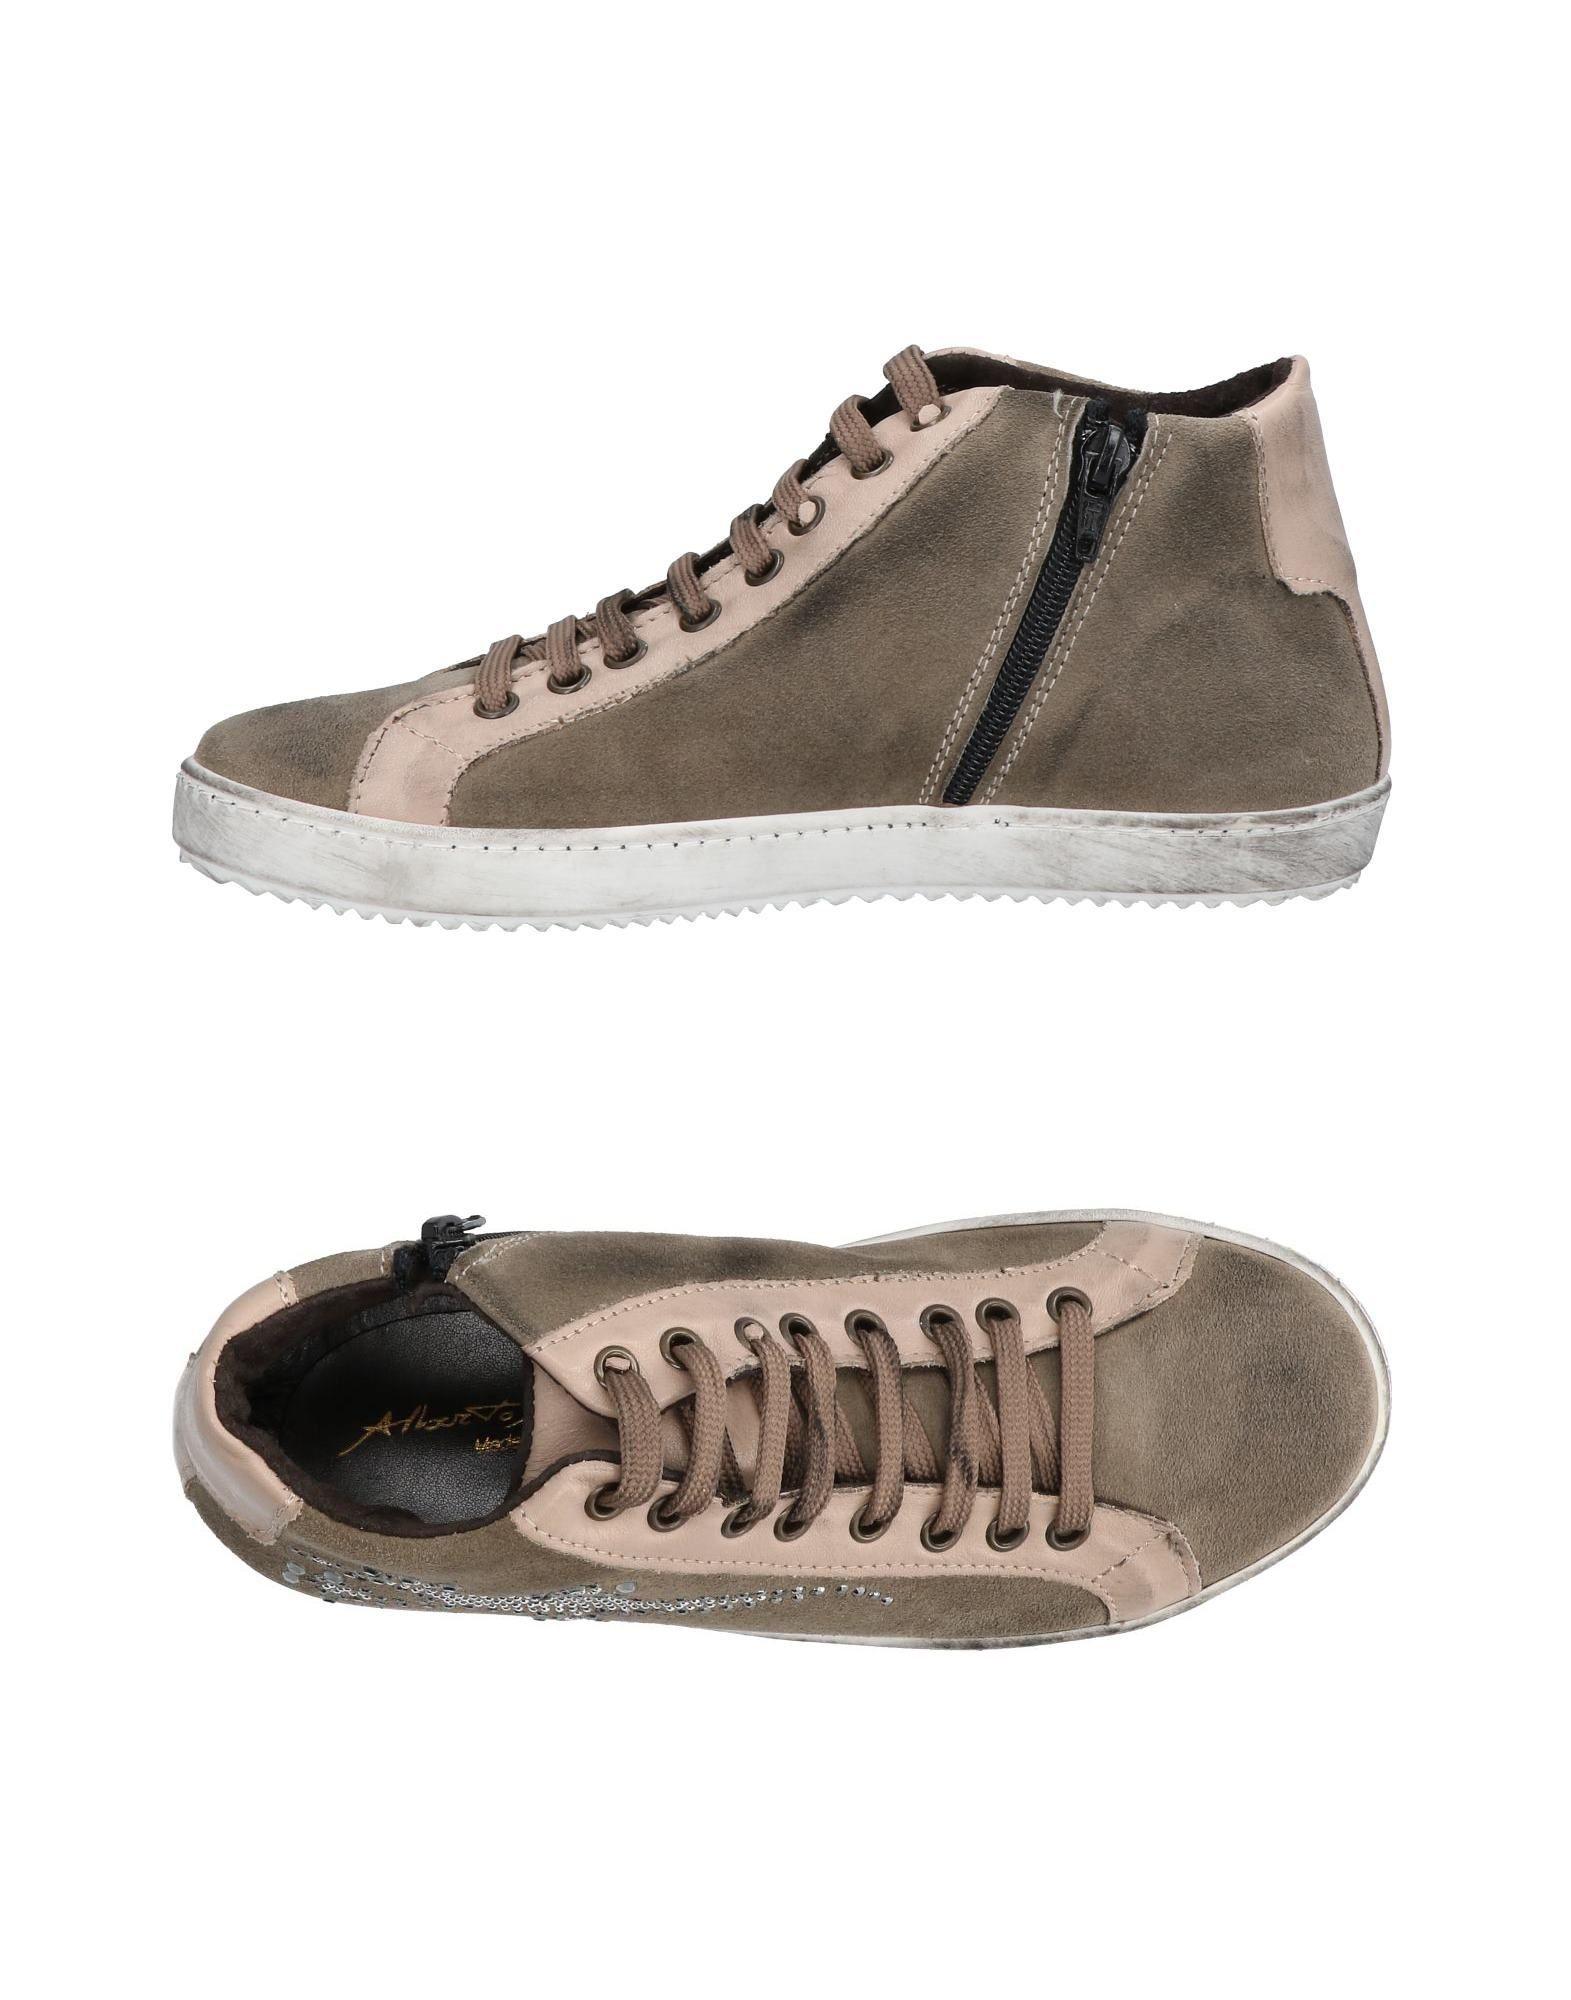 Alberto Moretti Sneakers Damen  11418626PG Gute Qualität beliebte Schuhe